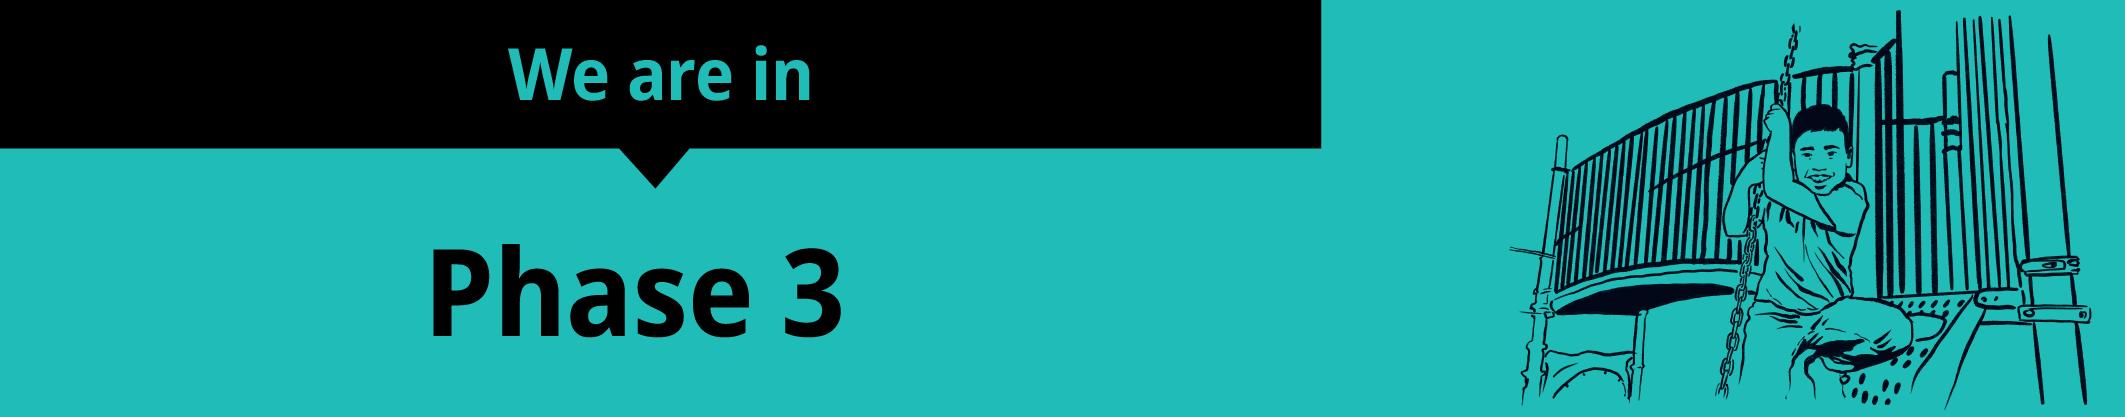 phase 3 banner